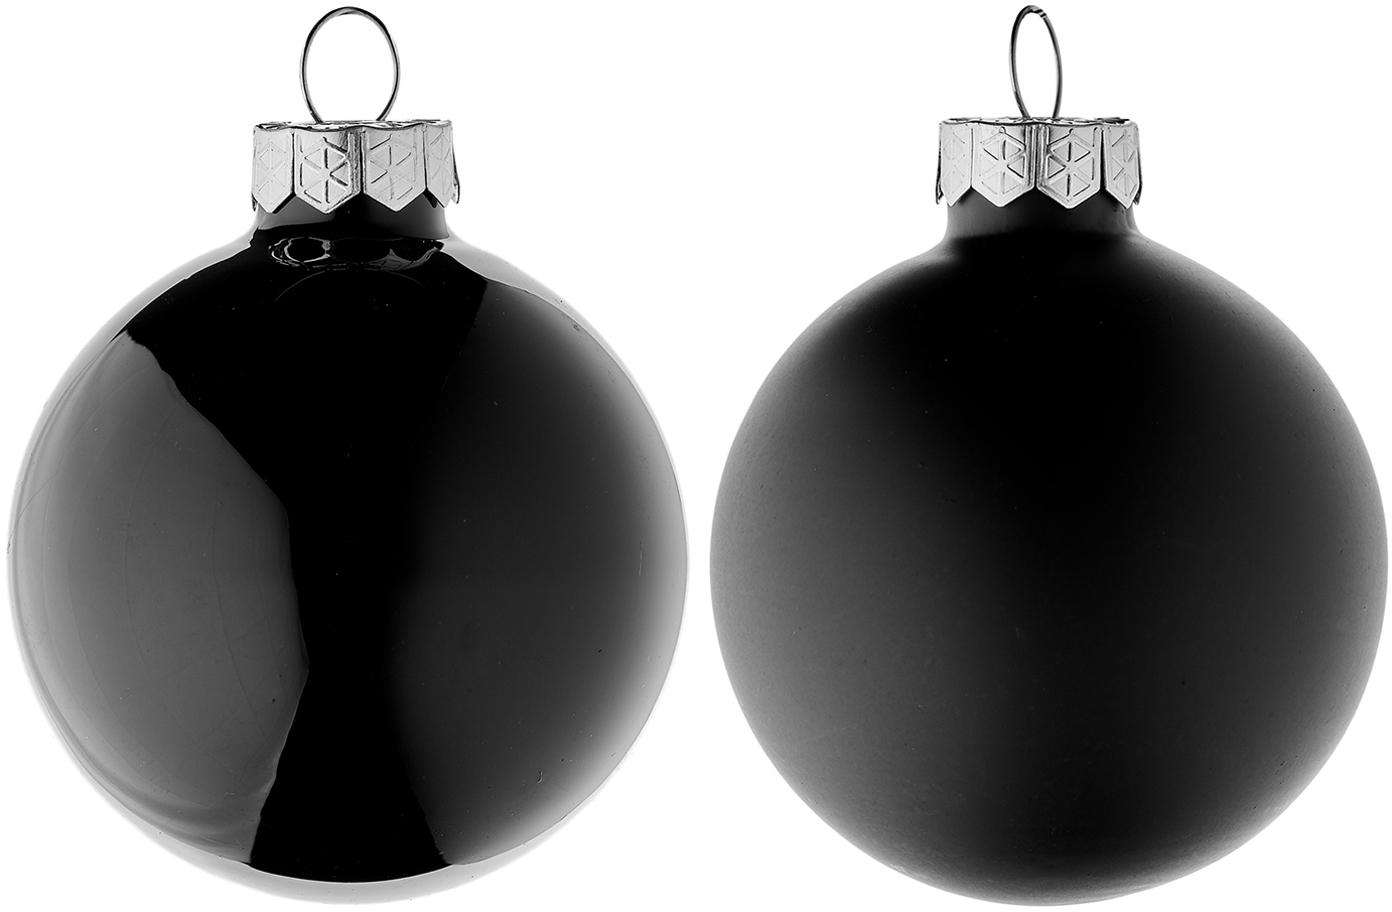 Set de bolas de Navidad Evergreen, Ø6cm, 10pzas., Negro, Ø 6 cm